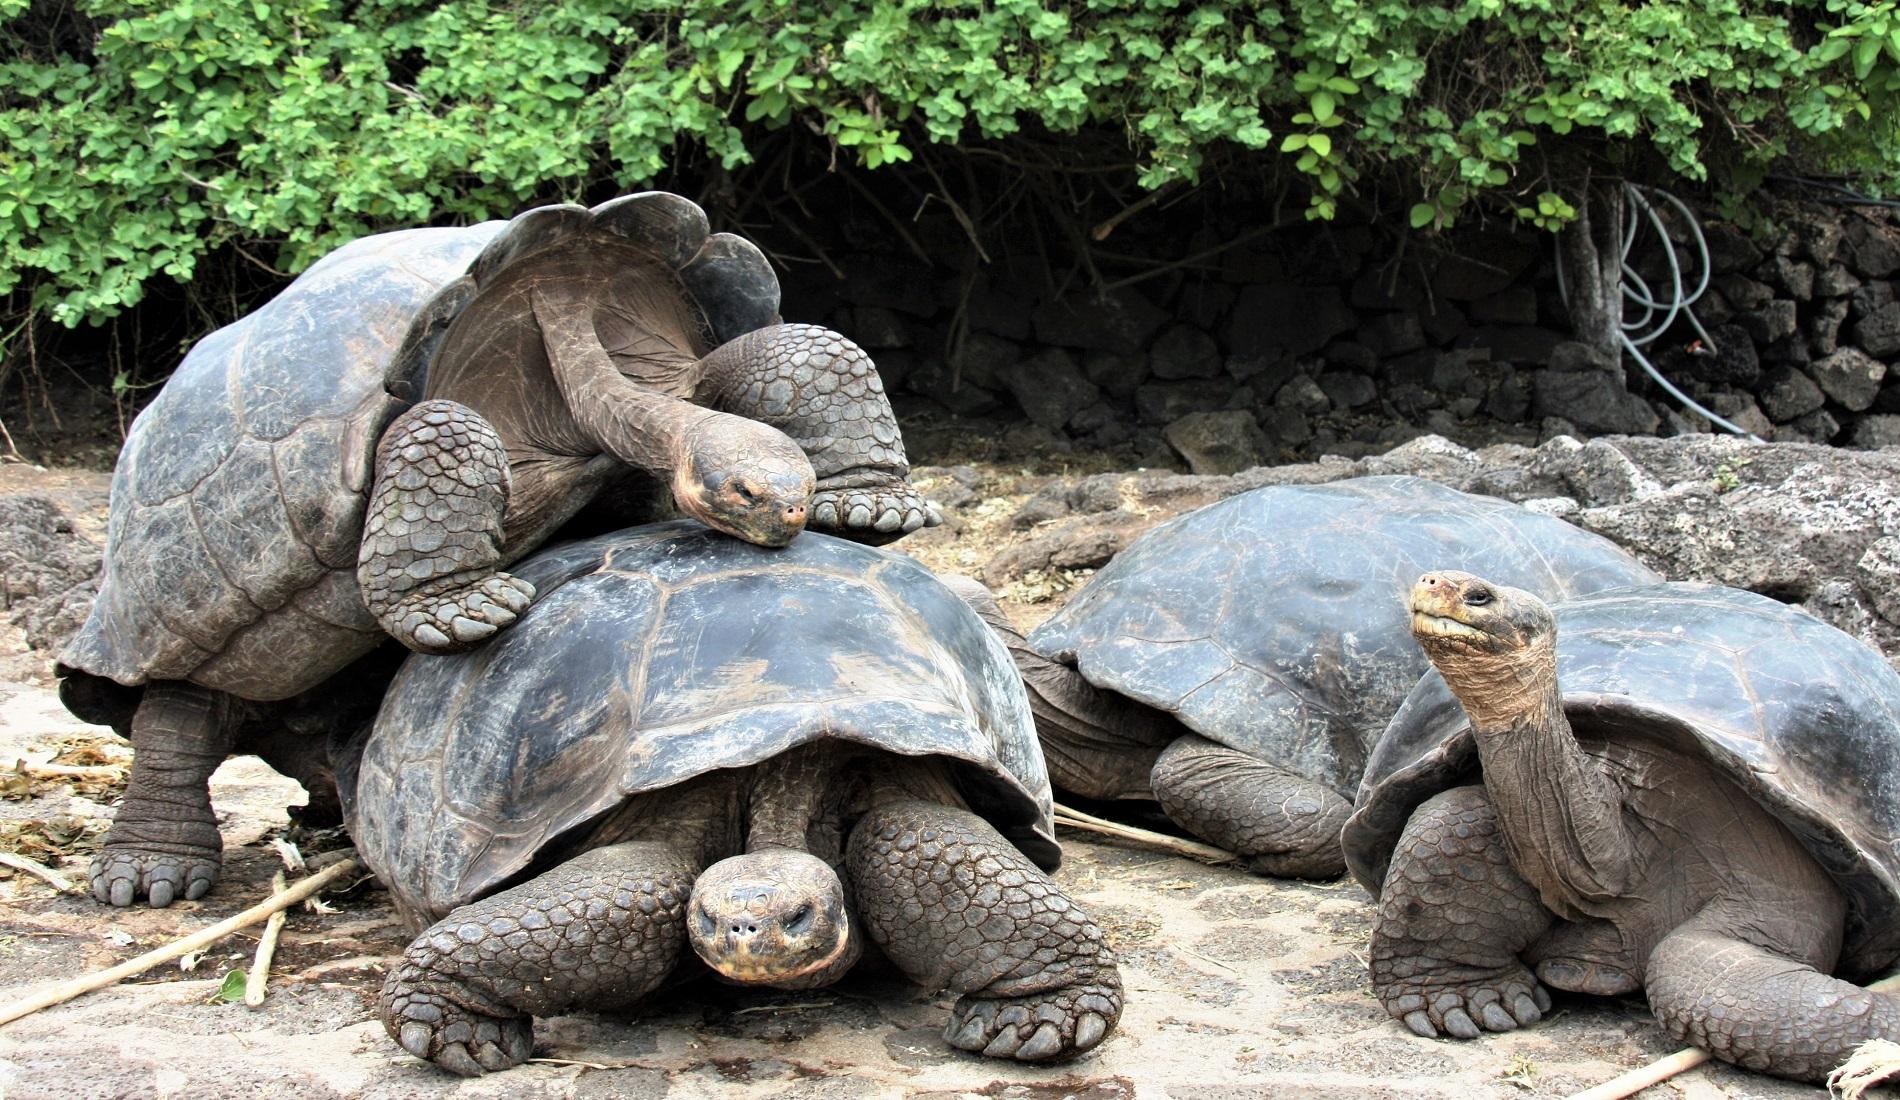 reuzenschildpadden galapagos eilanden